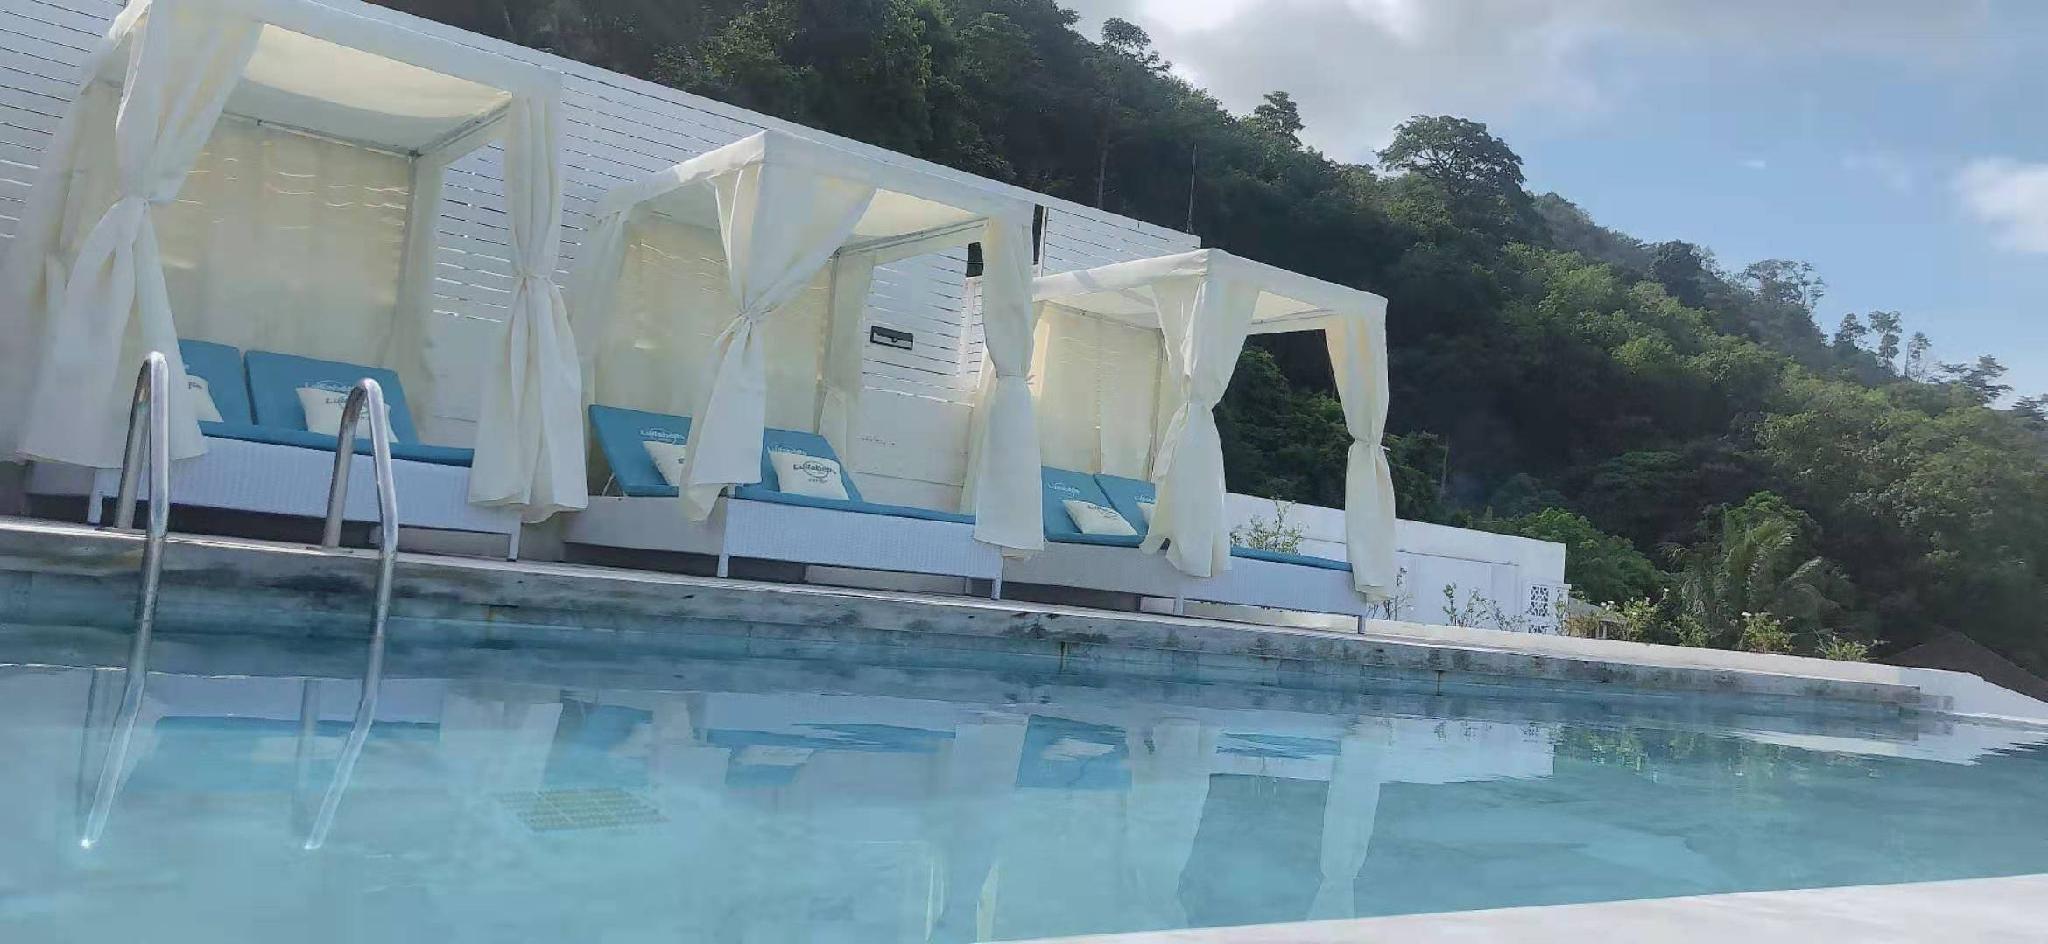 Lullabella Hotel Lullabella Hotel